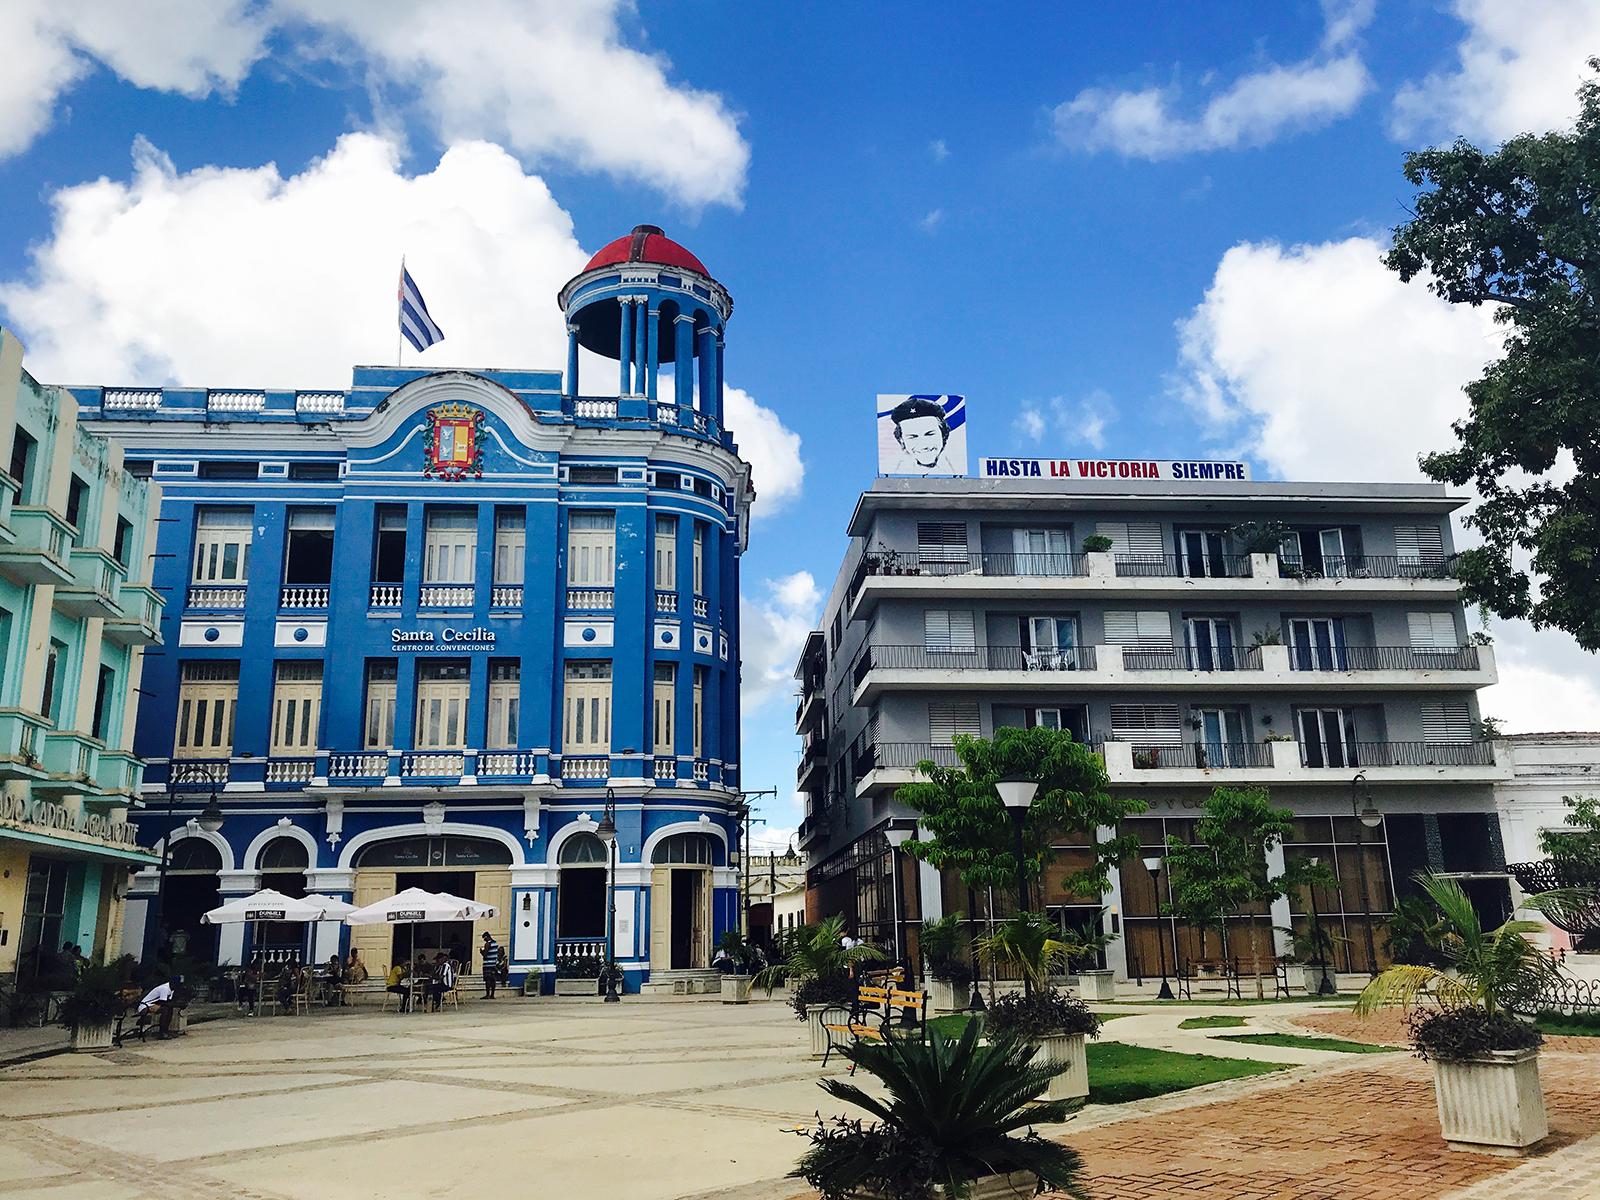 A public square in Camaguey, Cuba